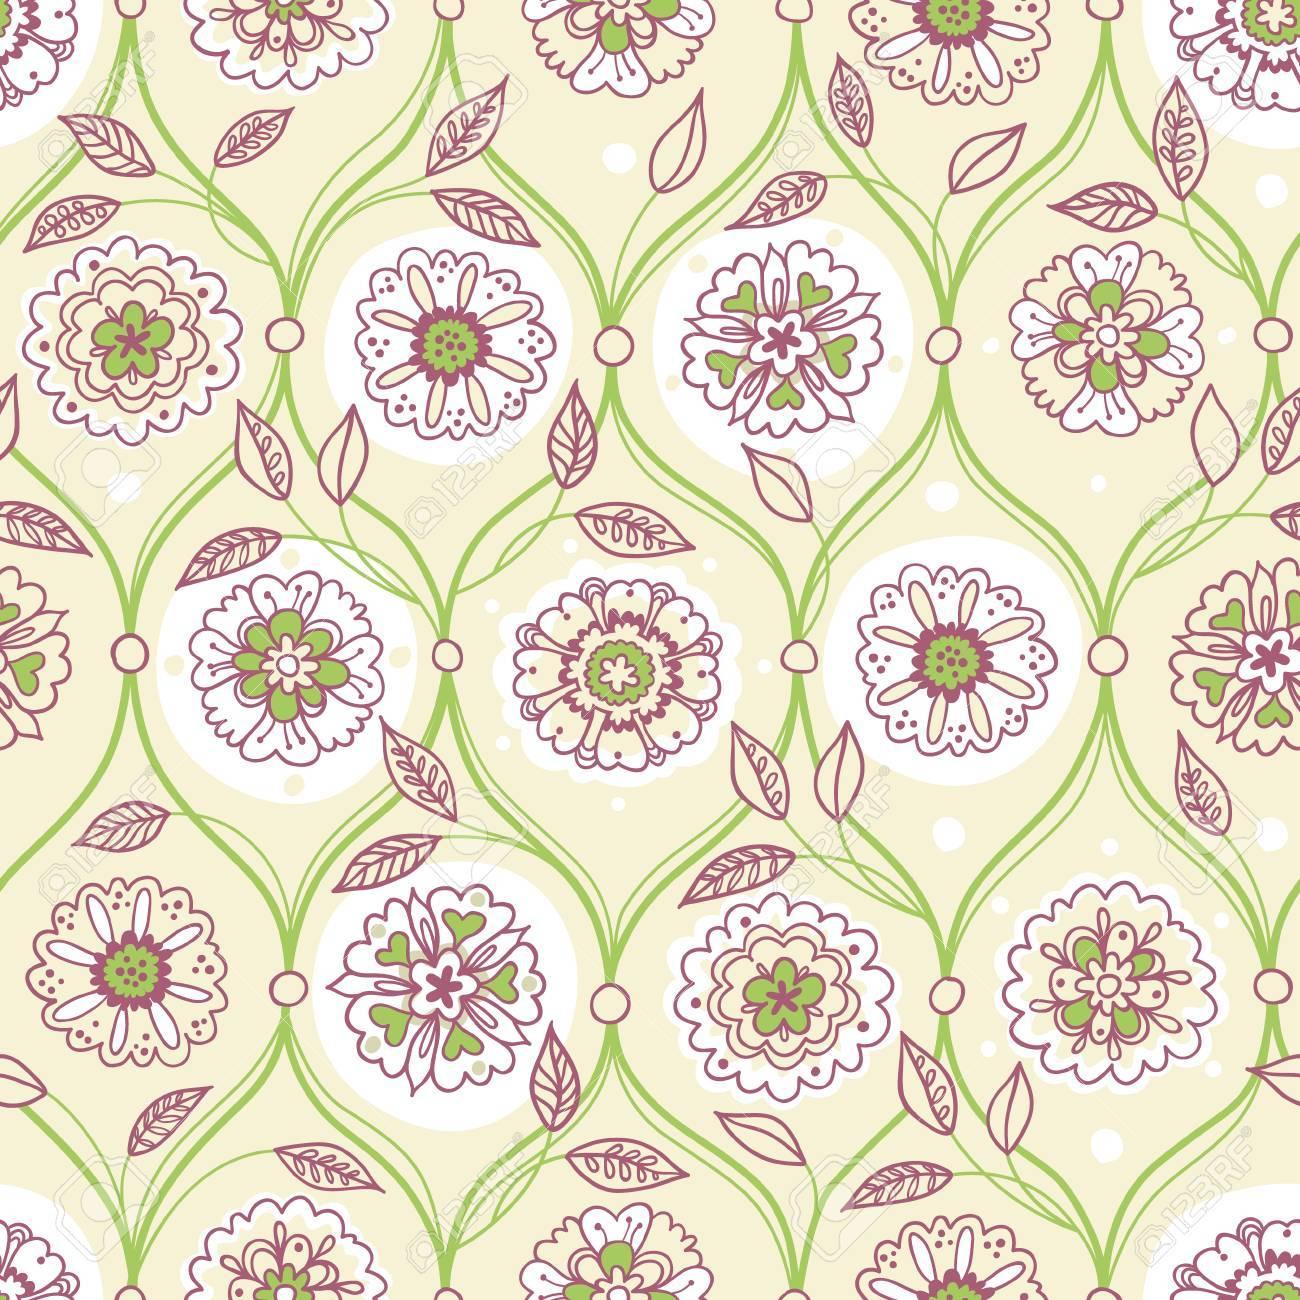 Vector Seamless Pattern Filigree Floral Background Vintage Element For Design In Eastern Style